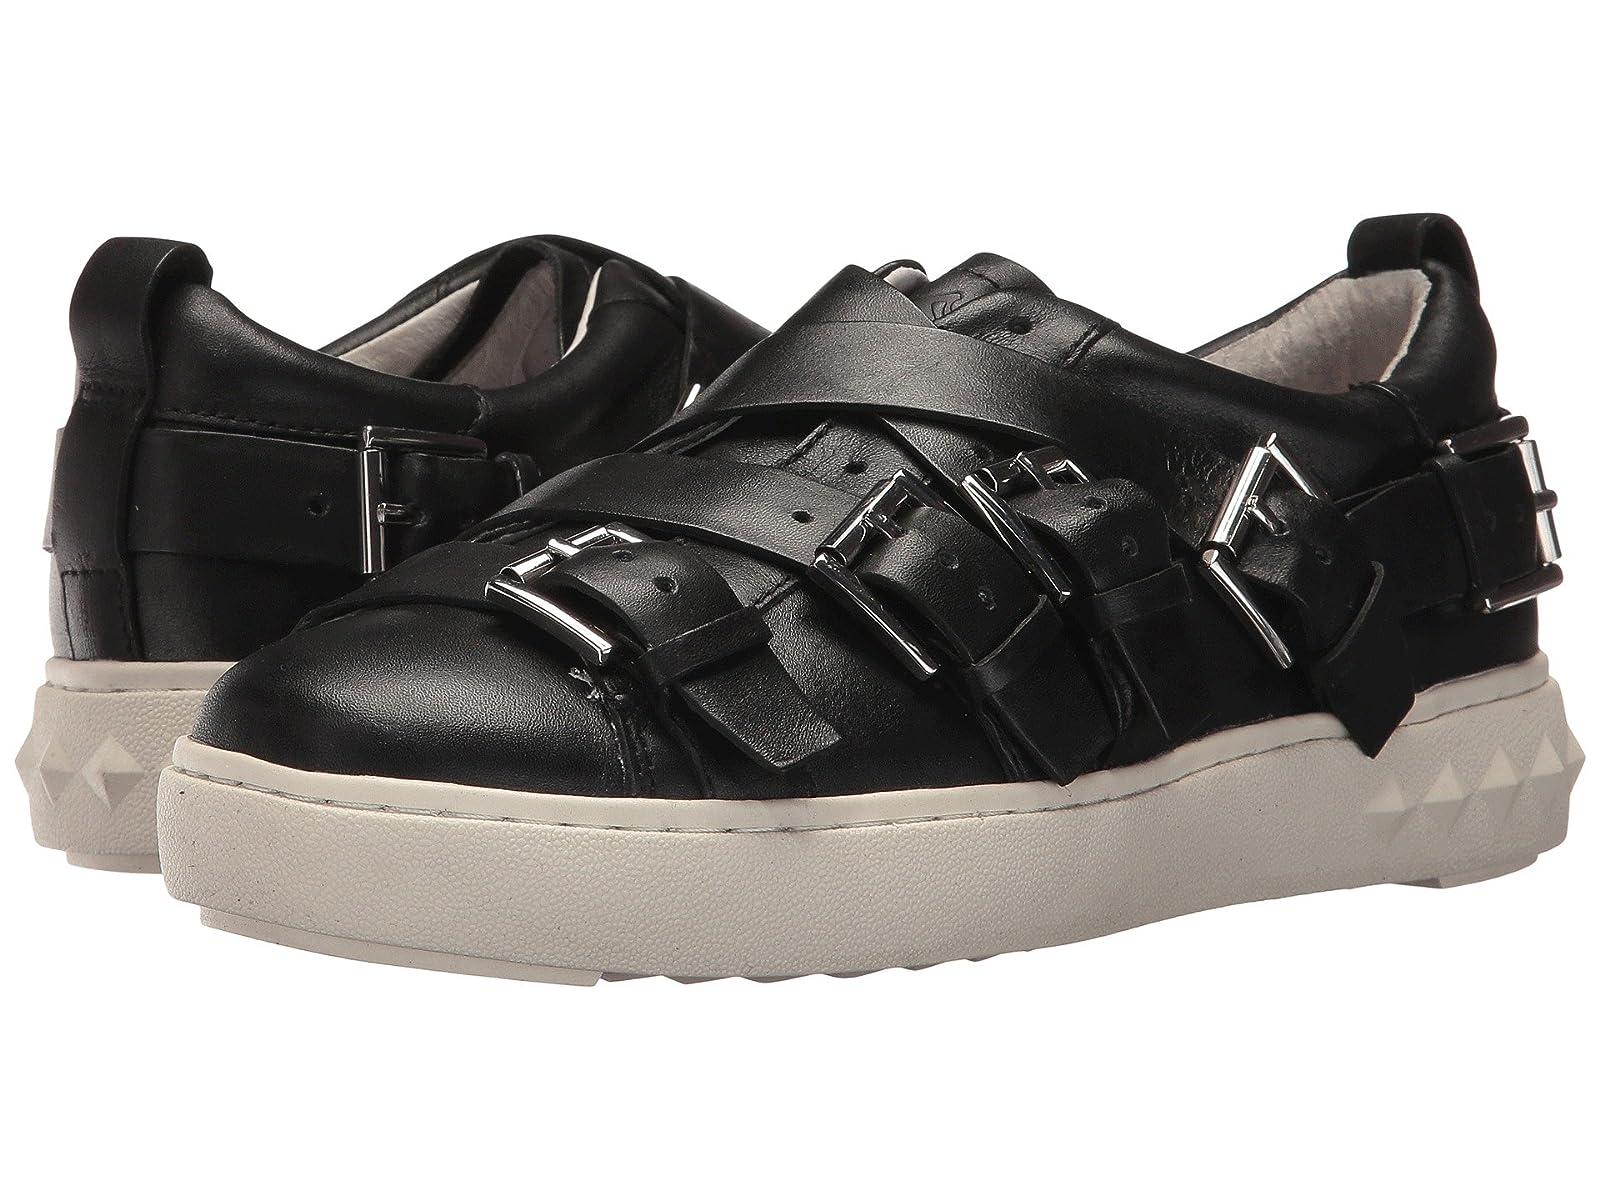 ASH PremiumCheap and distinctive eye-catching shoes